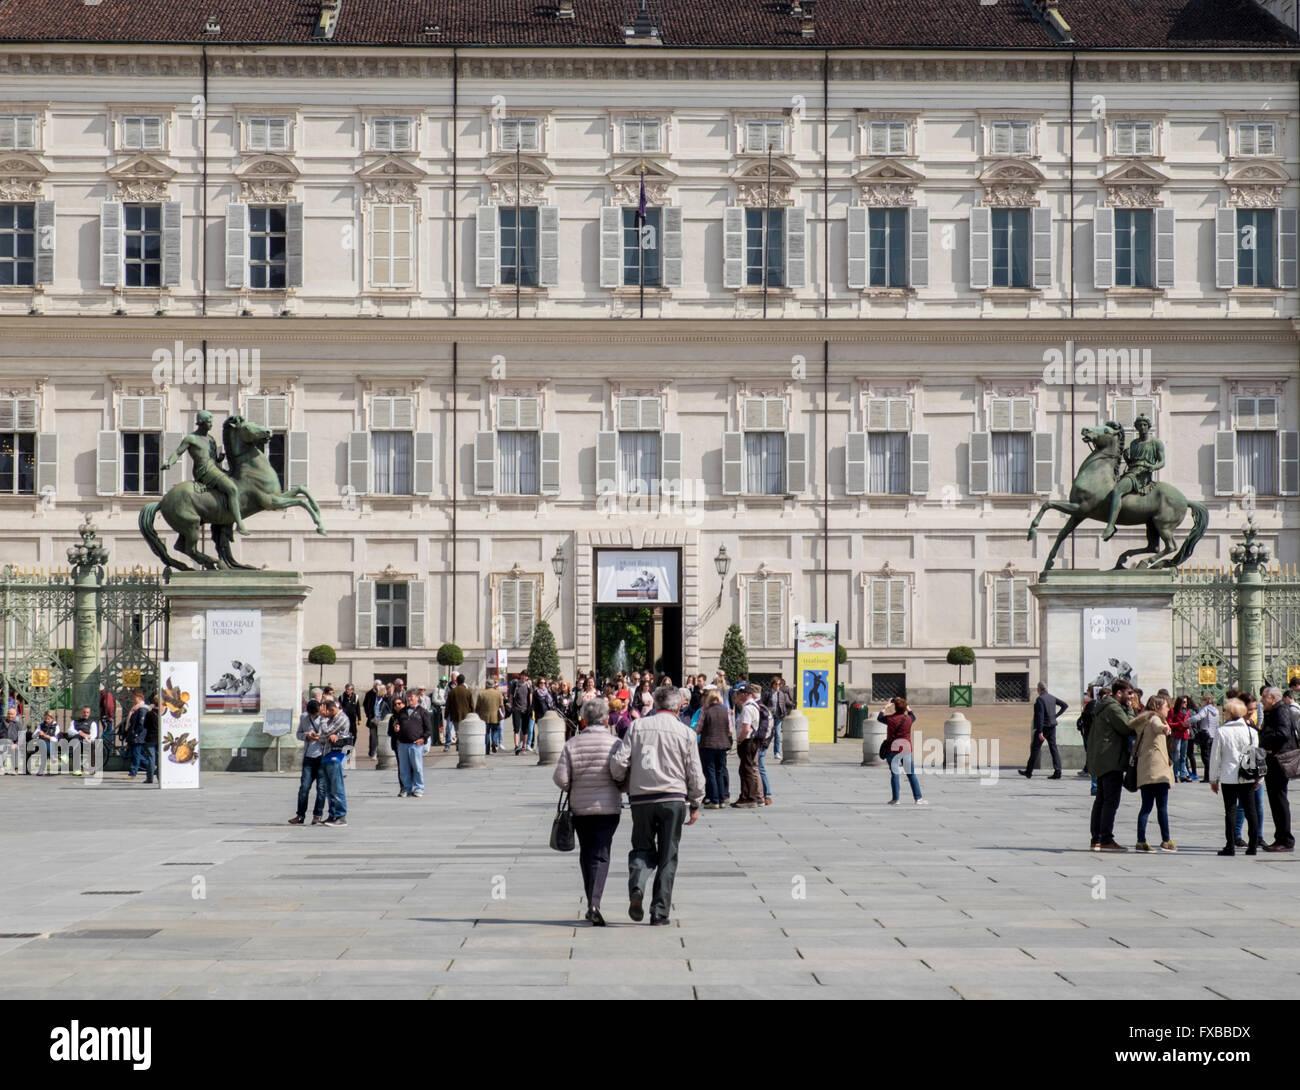 Palazzo Reale (Royal Palace), Turin, Piedmont, Italy - Stock Image